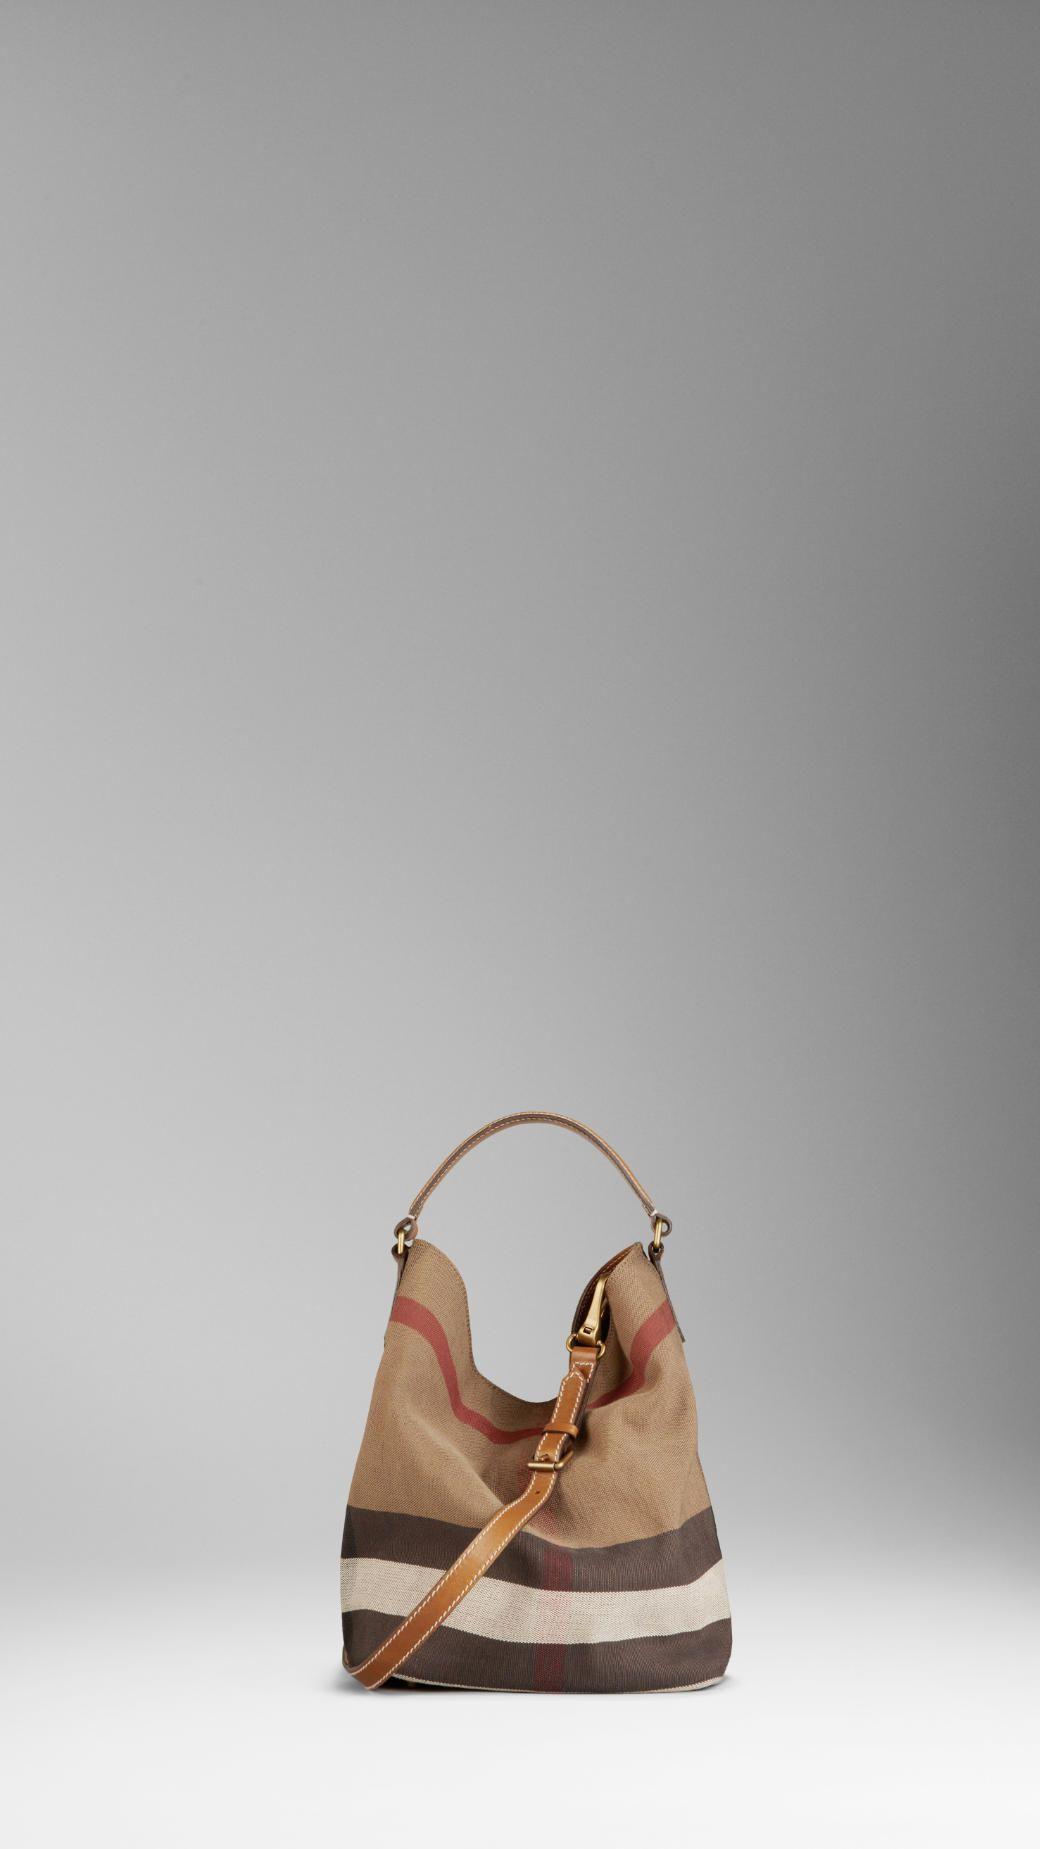 Shoulder Bags for Women   chica   Bags, Burberry, Shoulder Bag 87656928c2